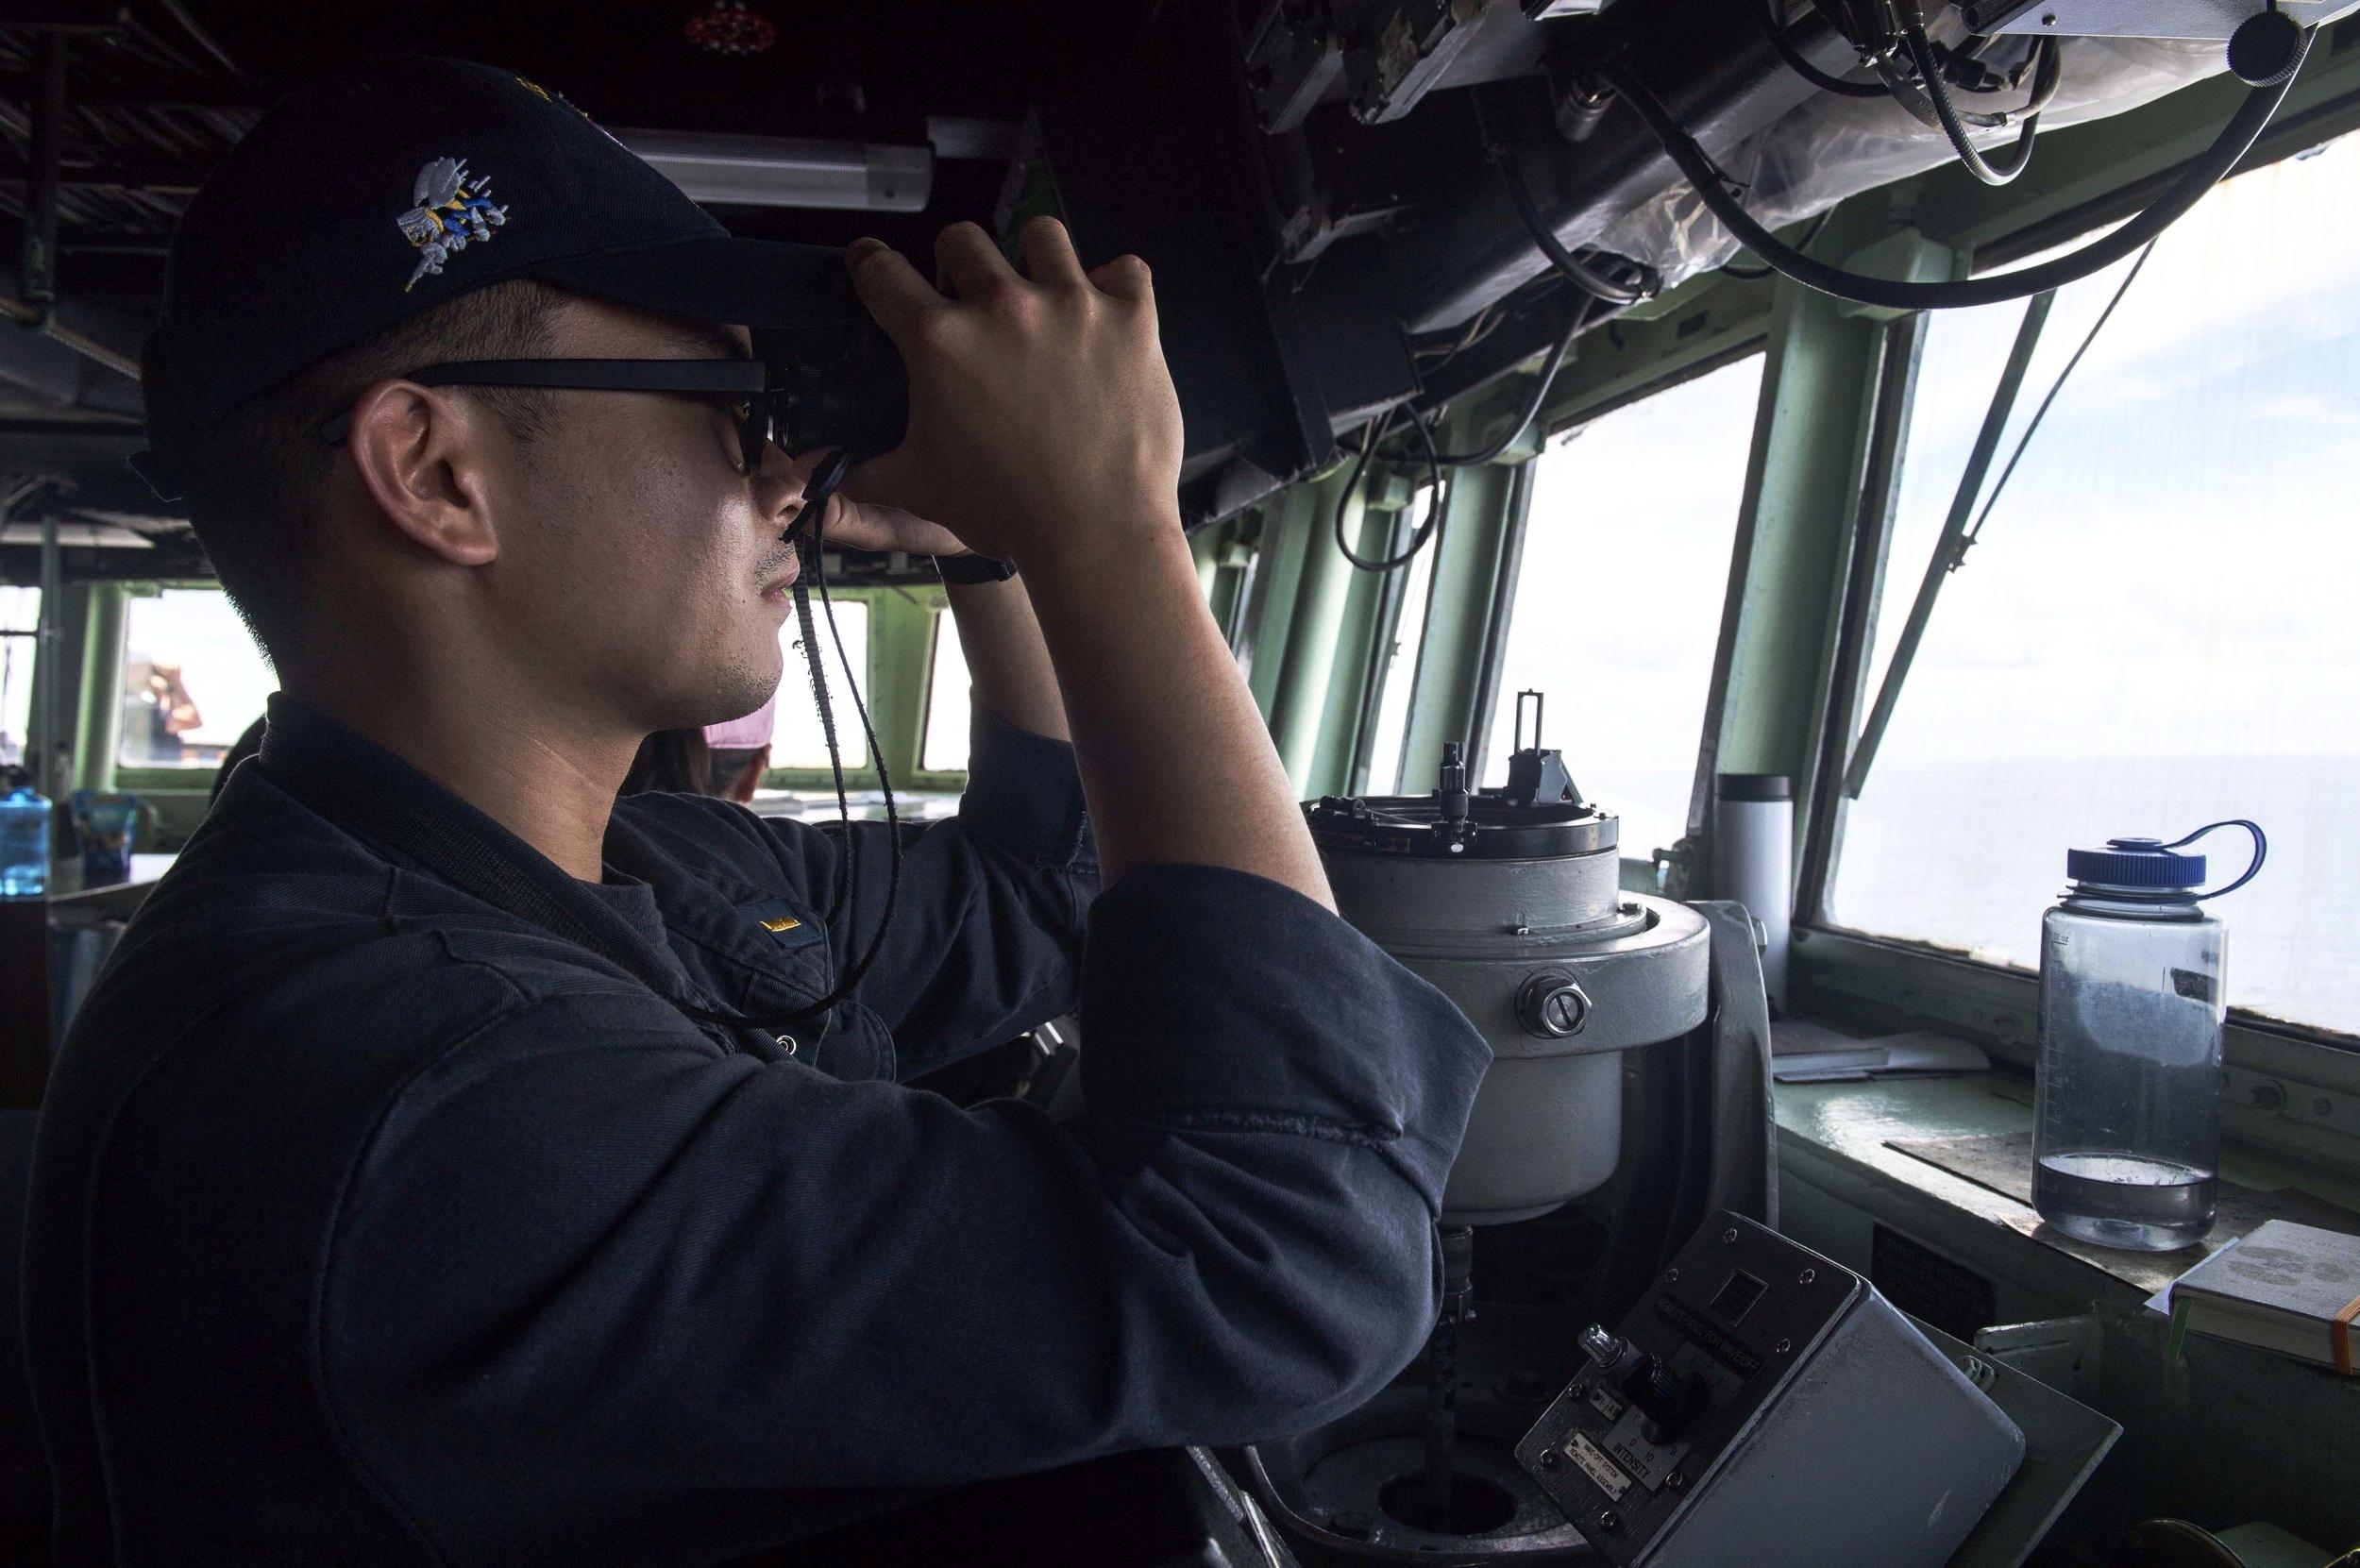 (Photo Credit:Petty Officer 2nd Class Ryan M Harper)